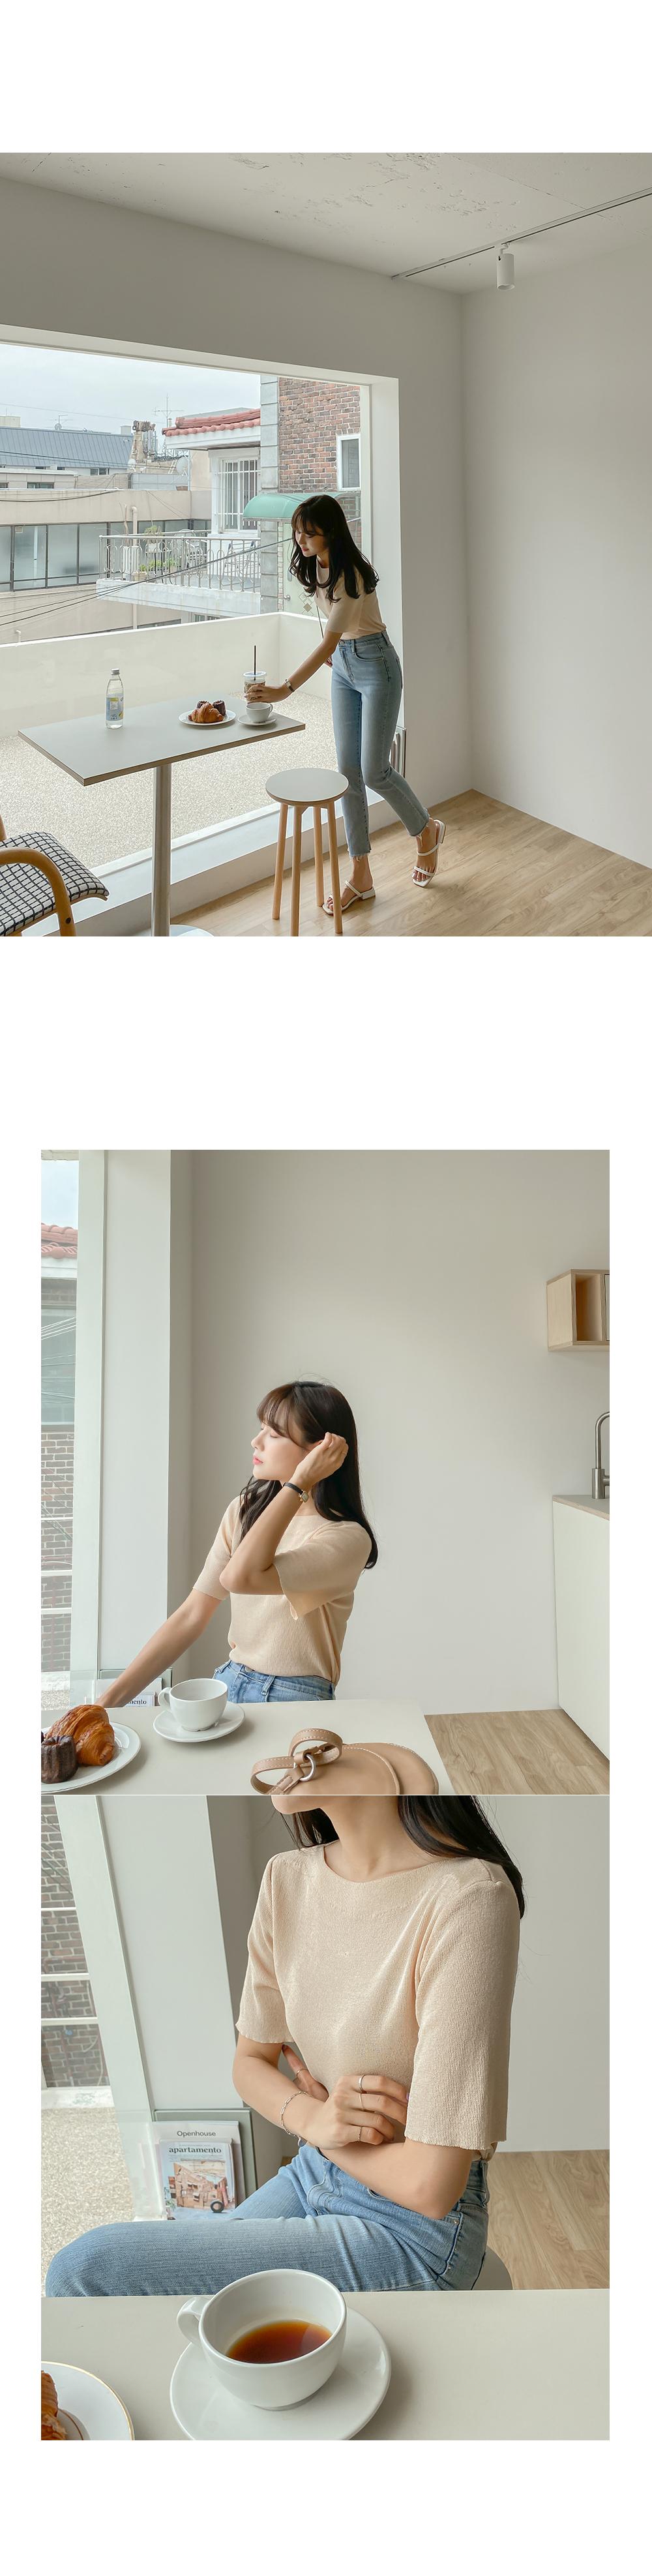 OJ-1134_7.jpg